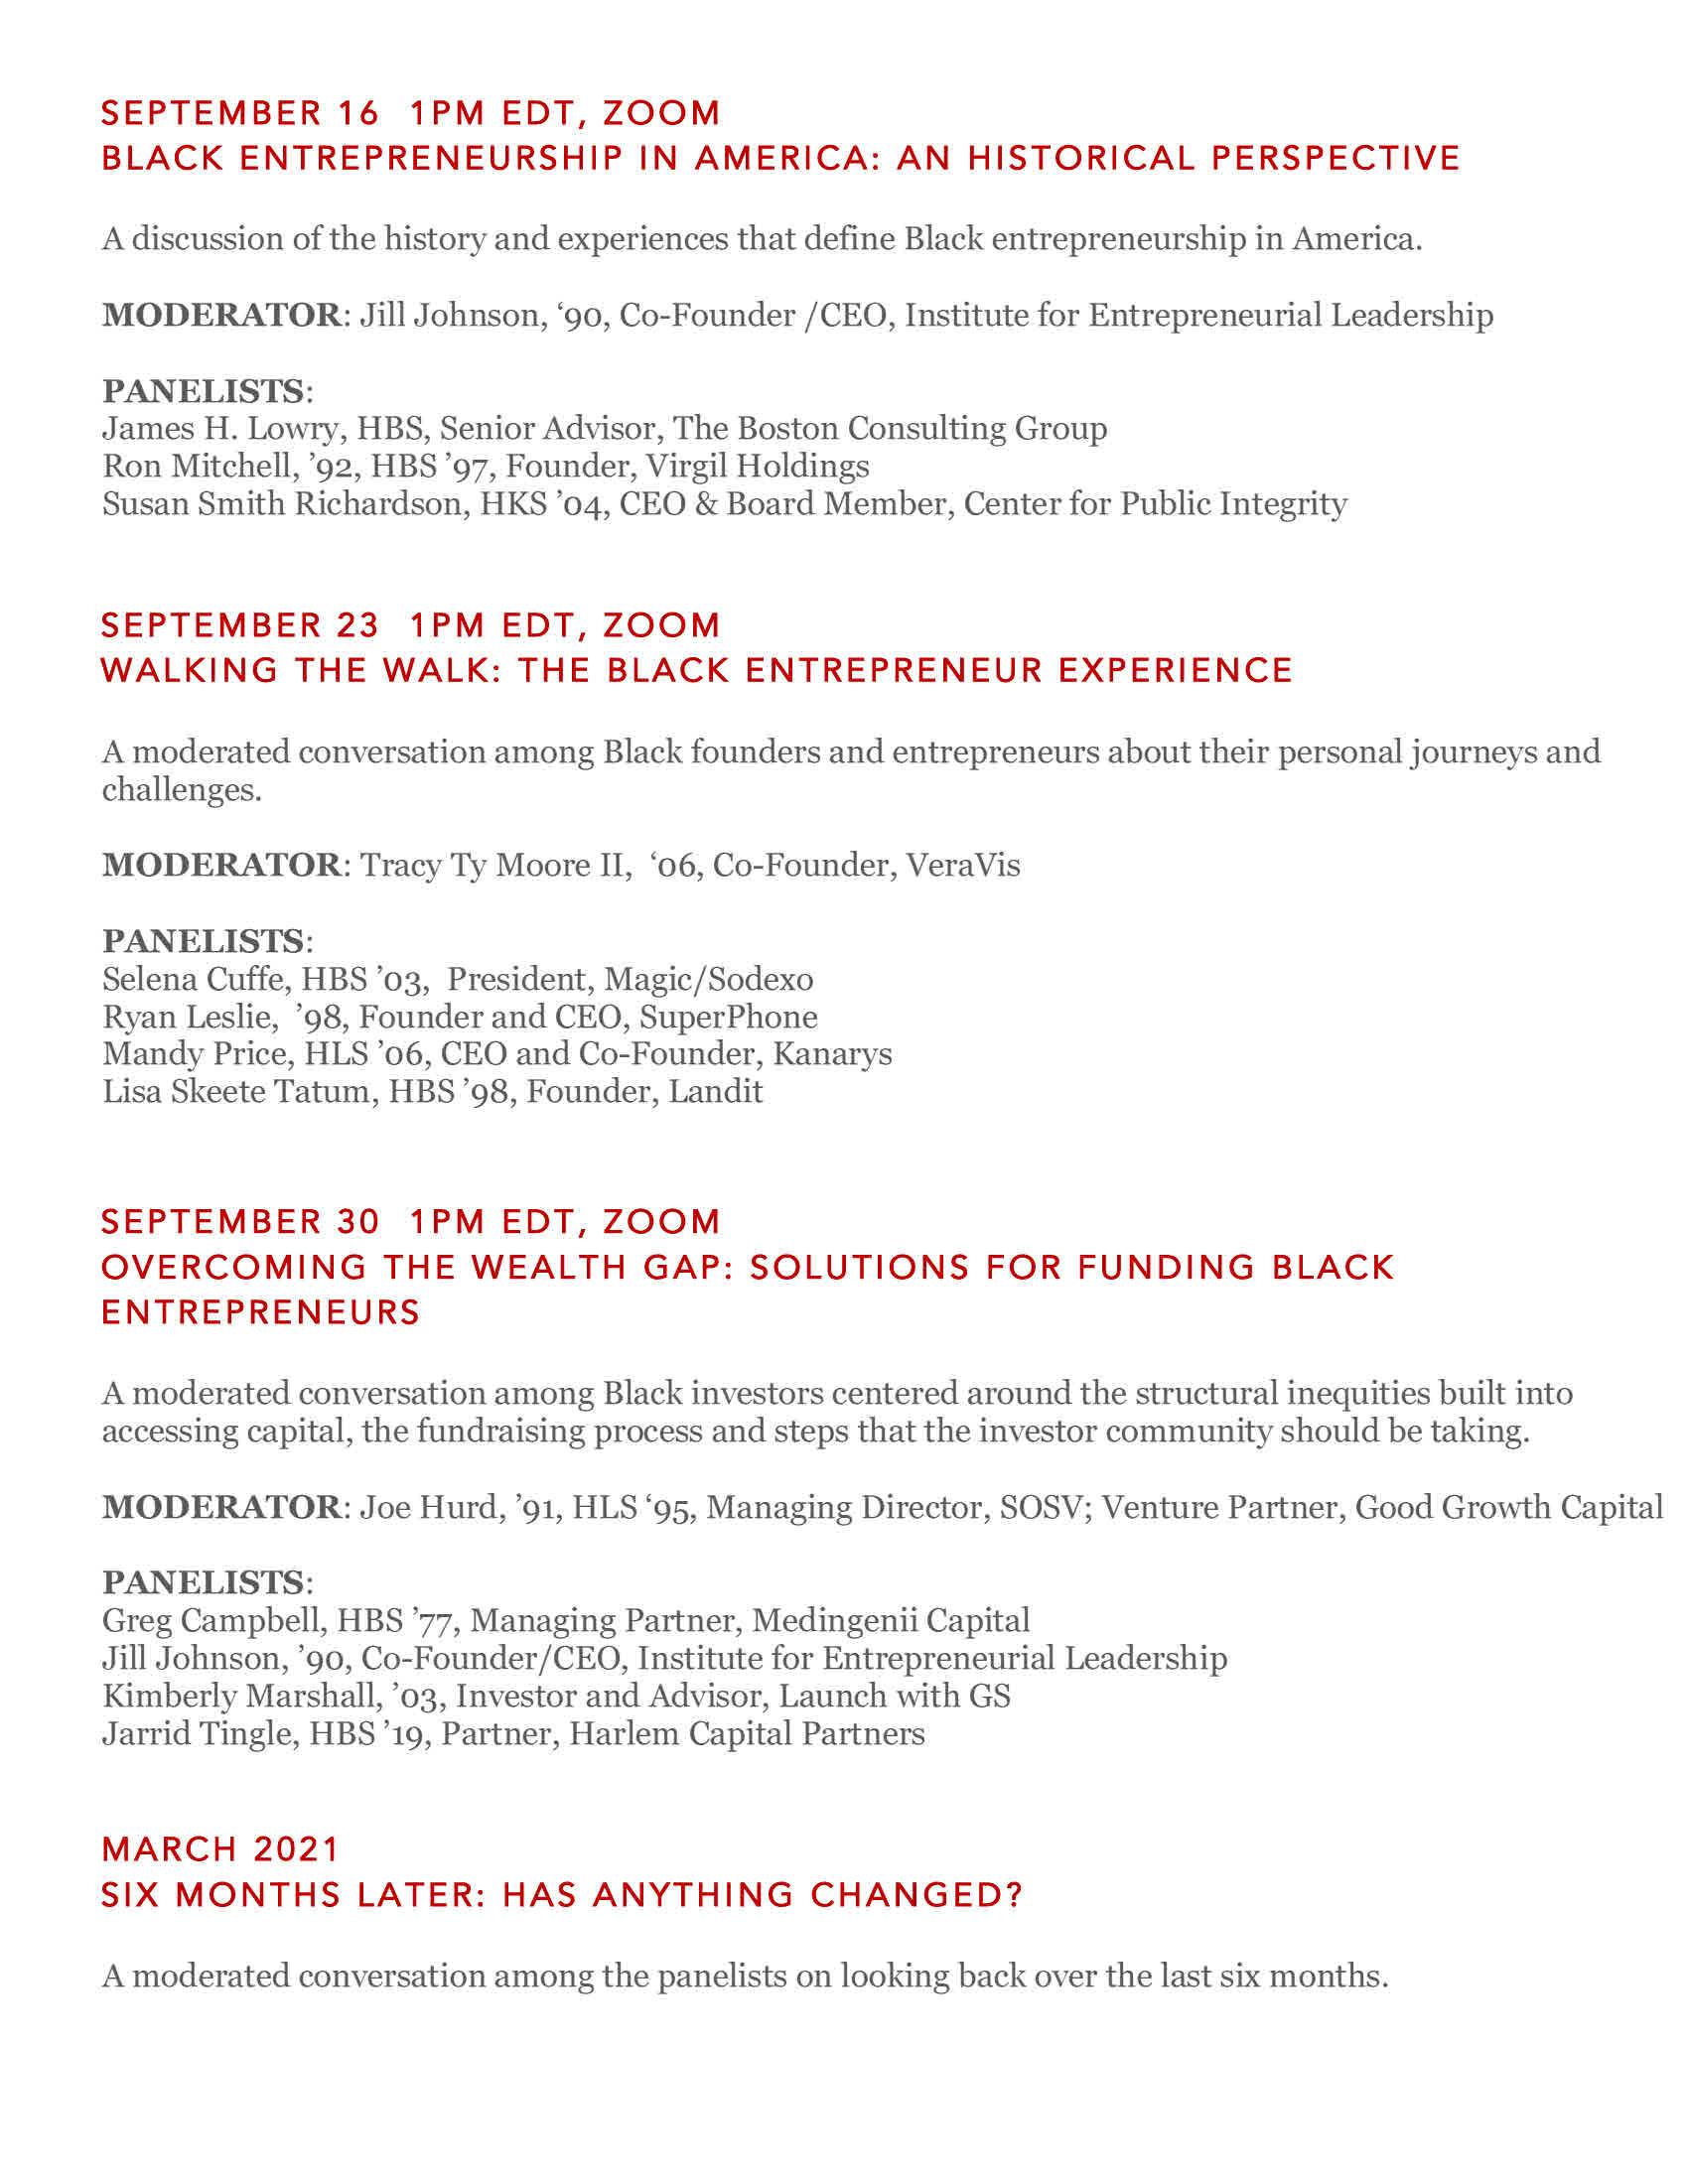 hae-advancing-diversity_overview_september-2020--4-